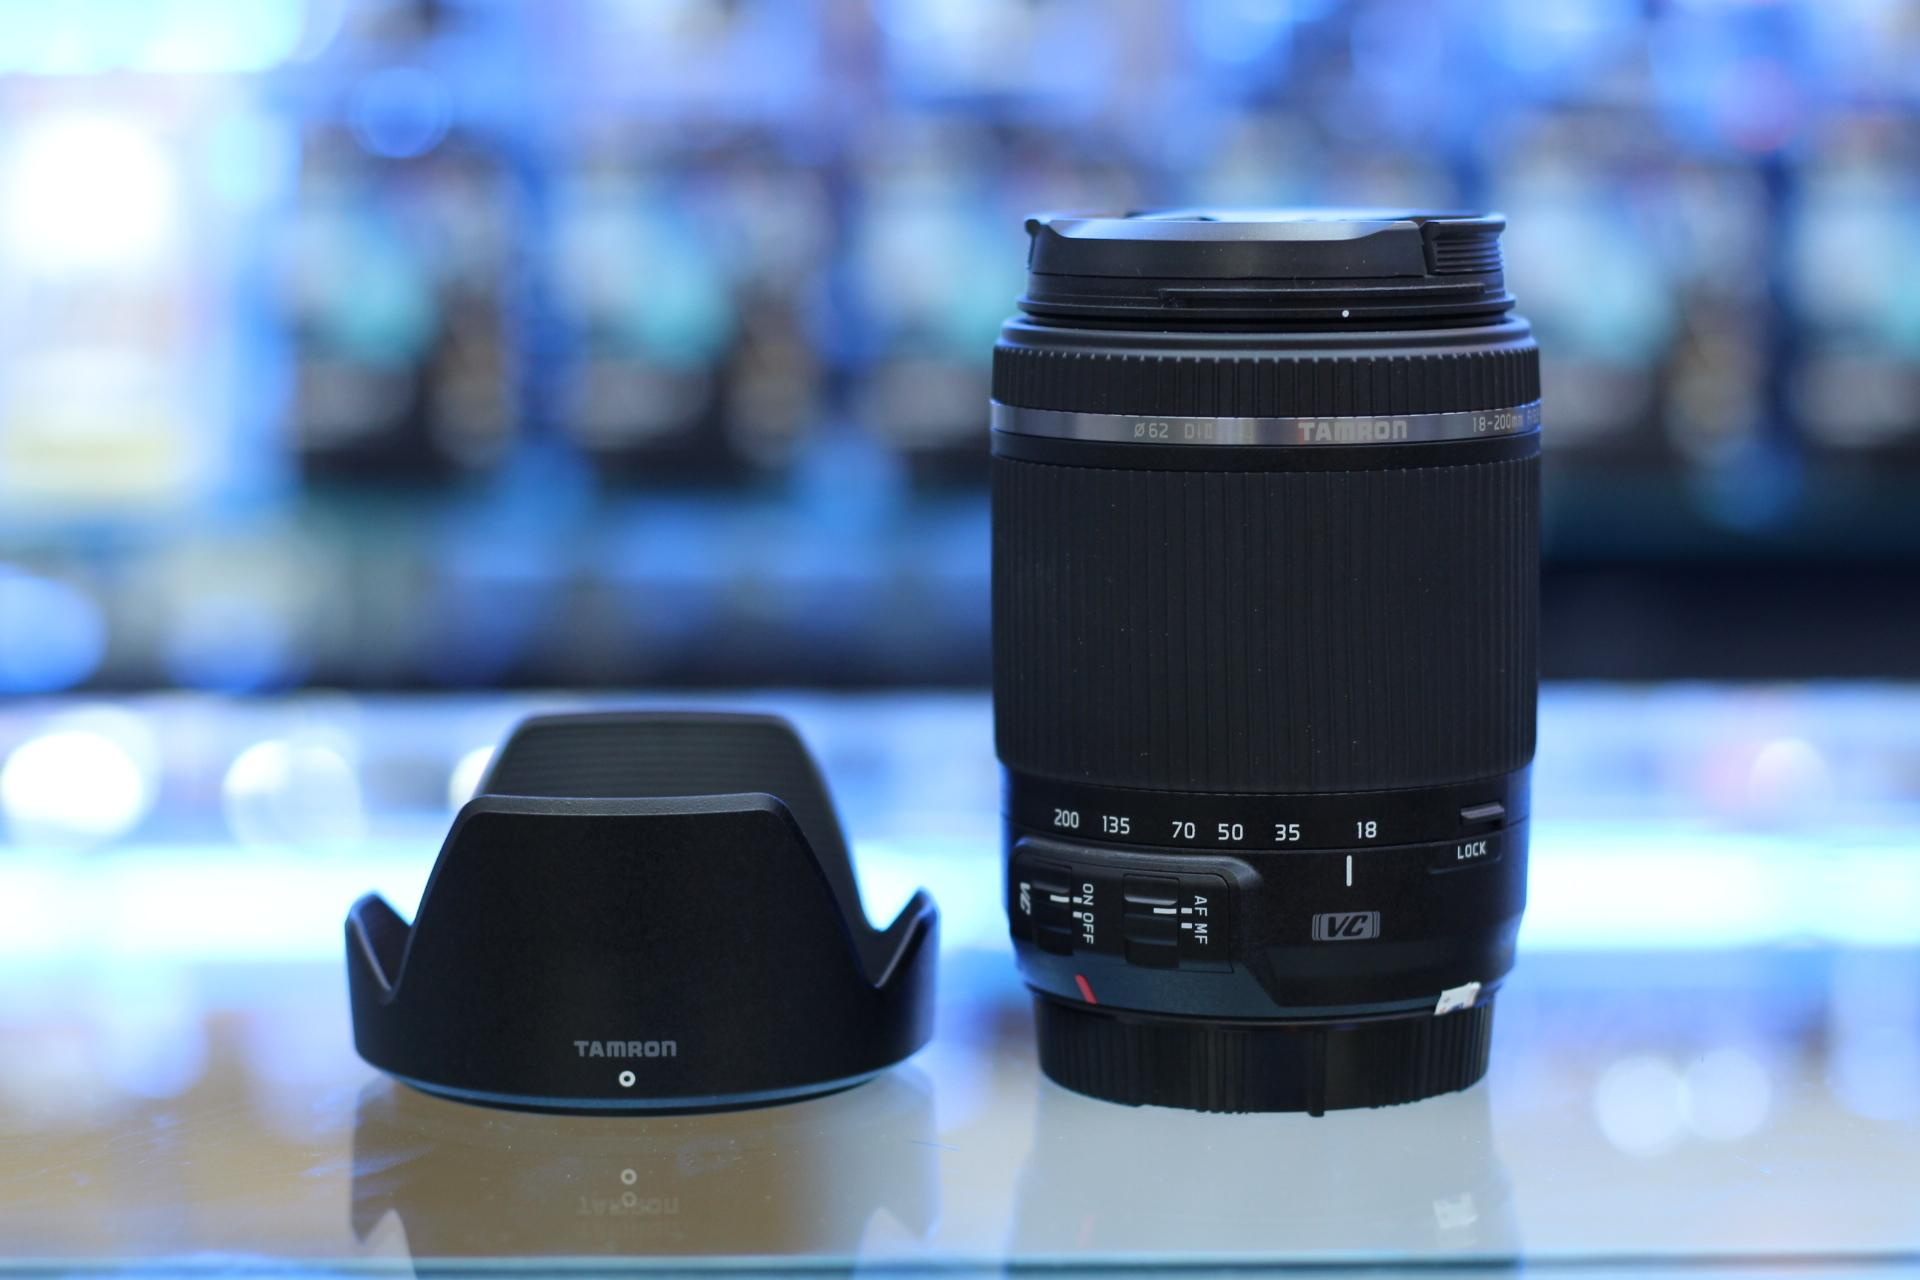 Lensa Kamera Tamron 18-200 VC Bonus Filter Pelindung Lensa